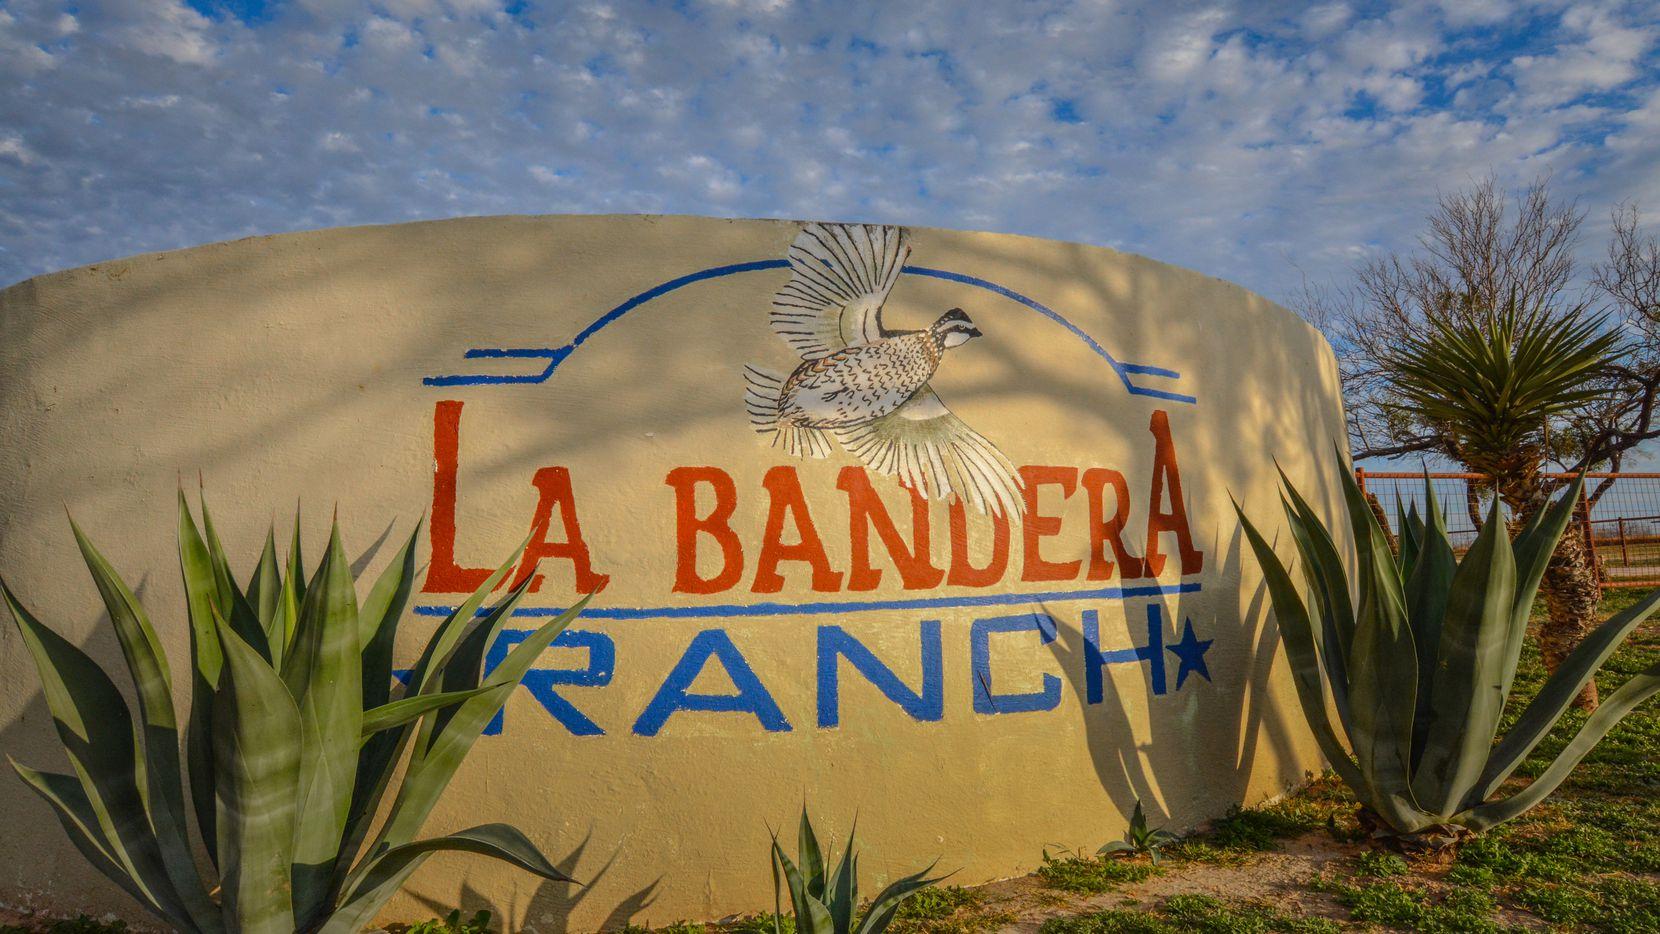 La Bandera Ranch southwest of San Antonio stretches more than 18,000 acres.